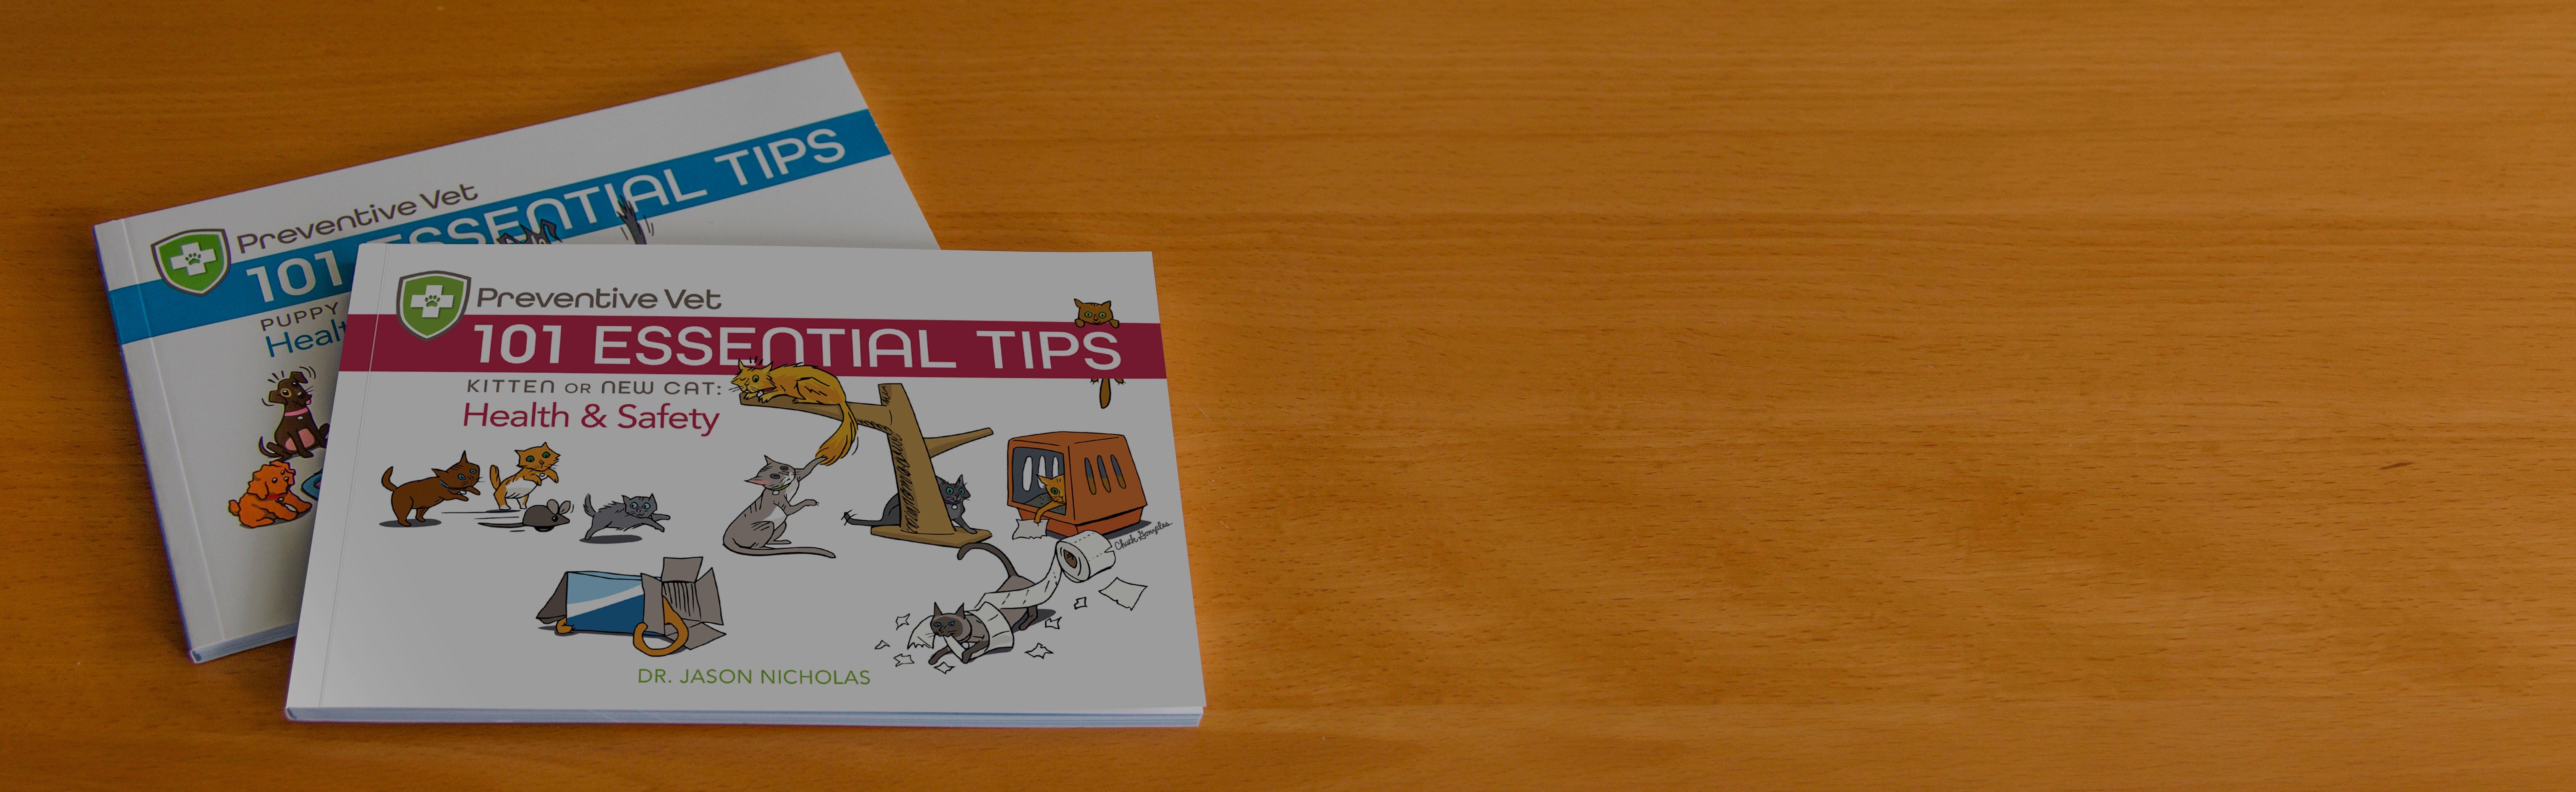 Two Books_3.jpg